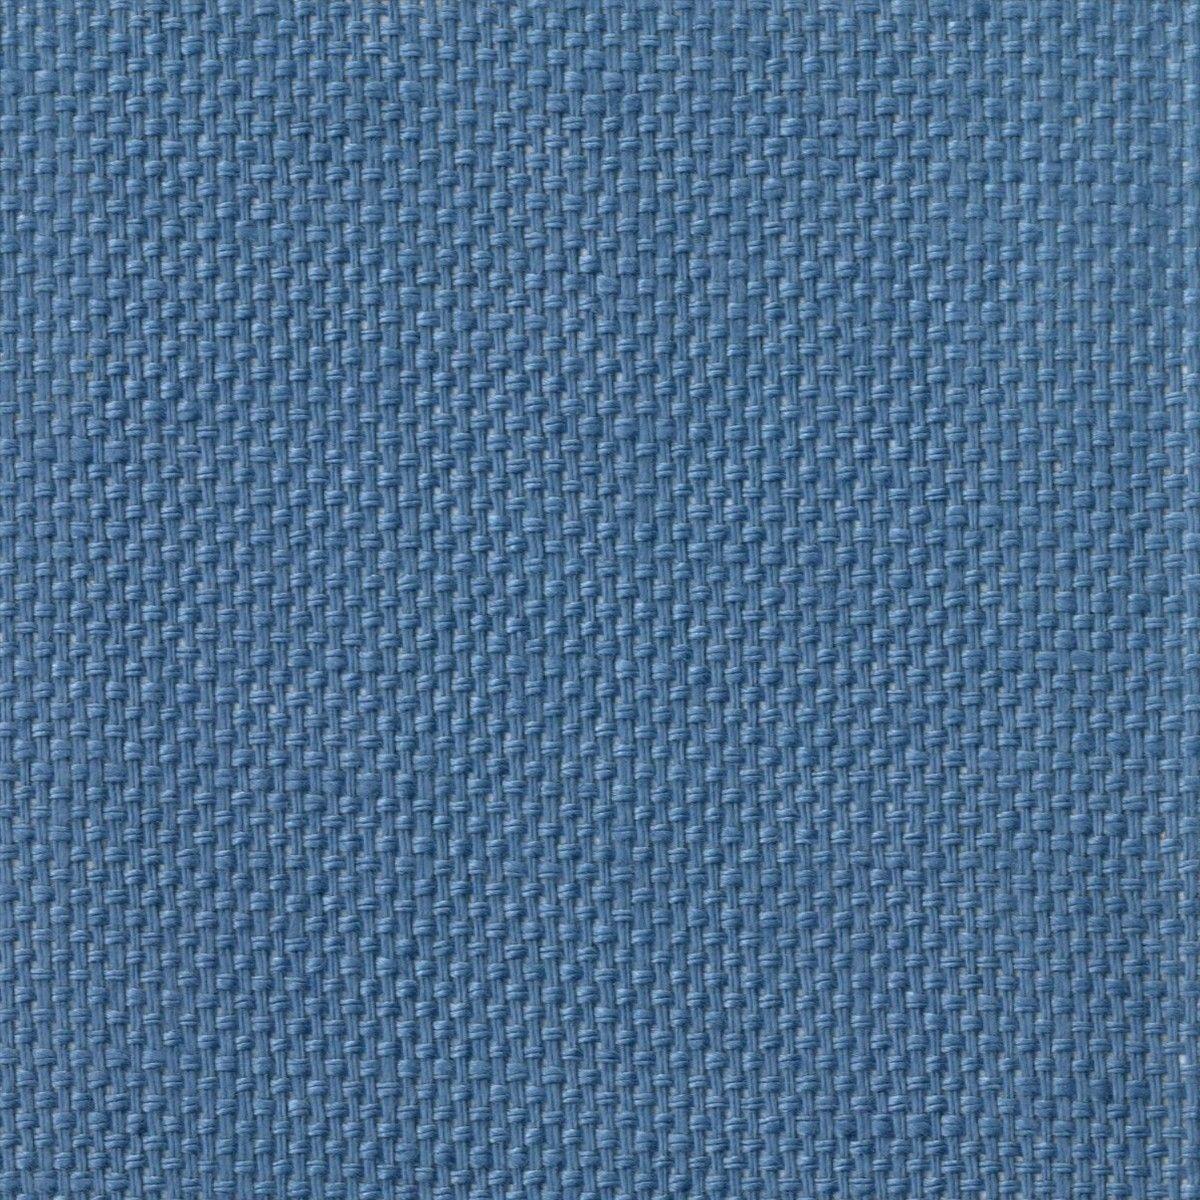 Light blue linen fabric anichini fabrics linen for Fabric material